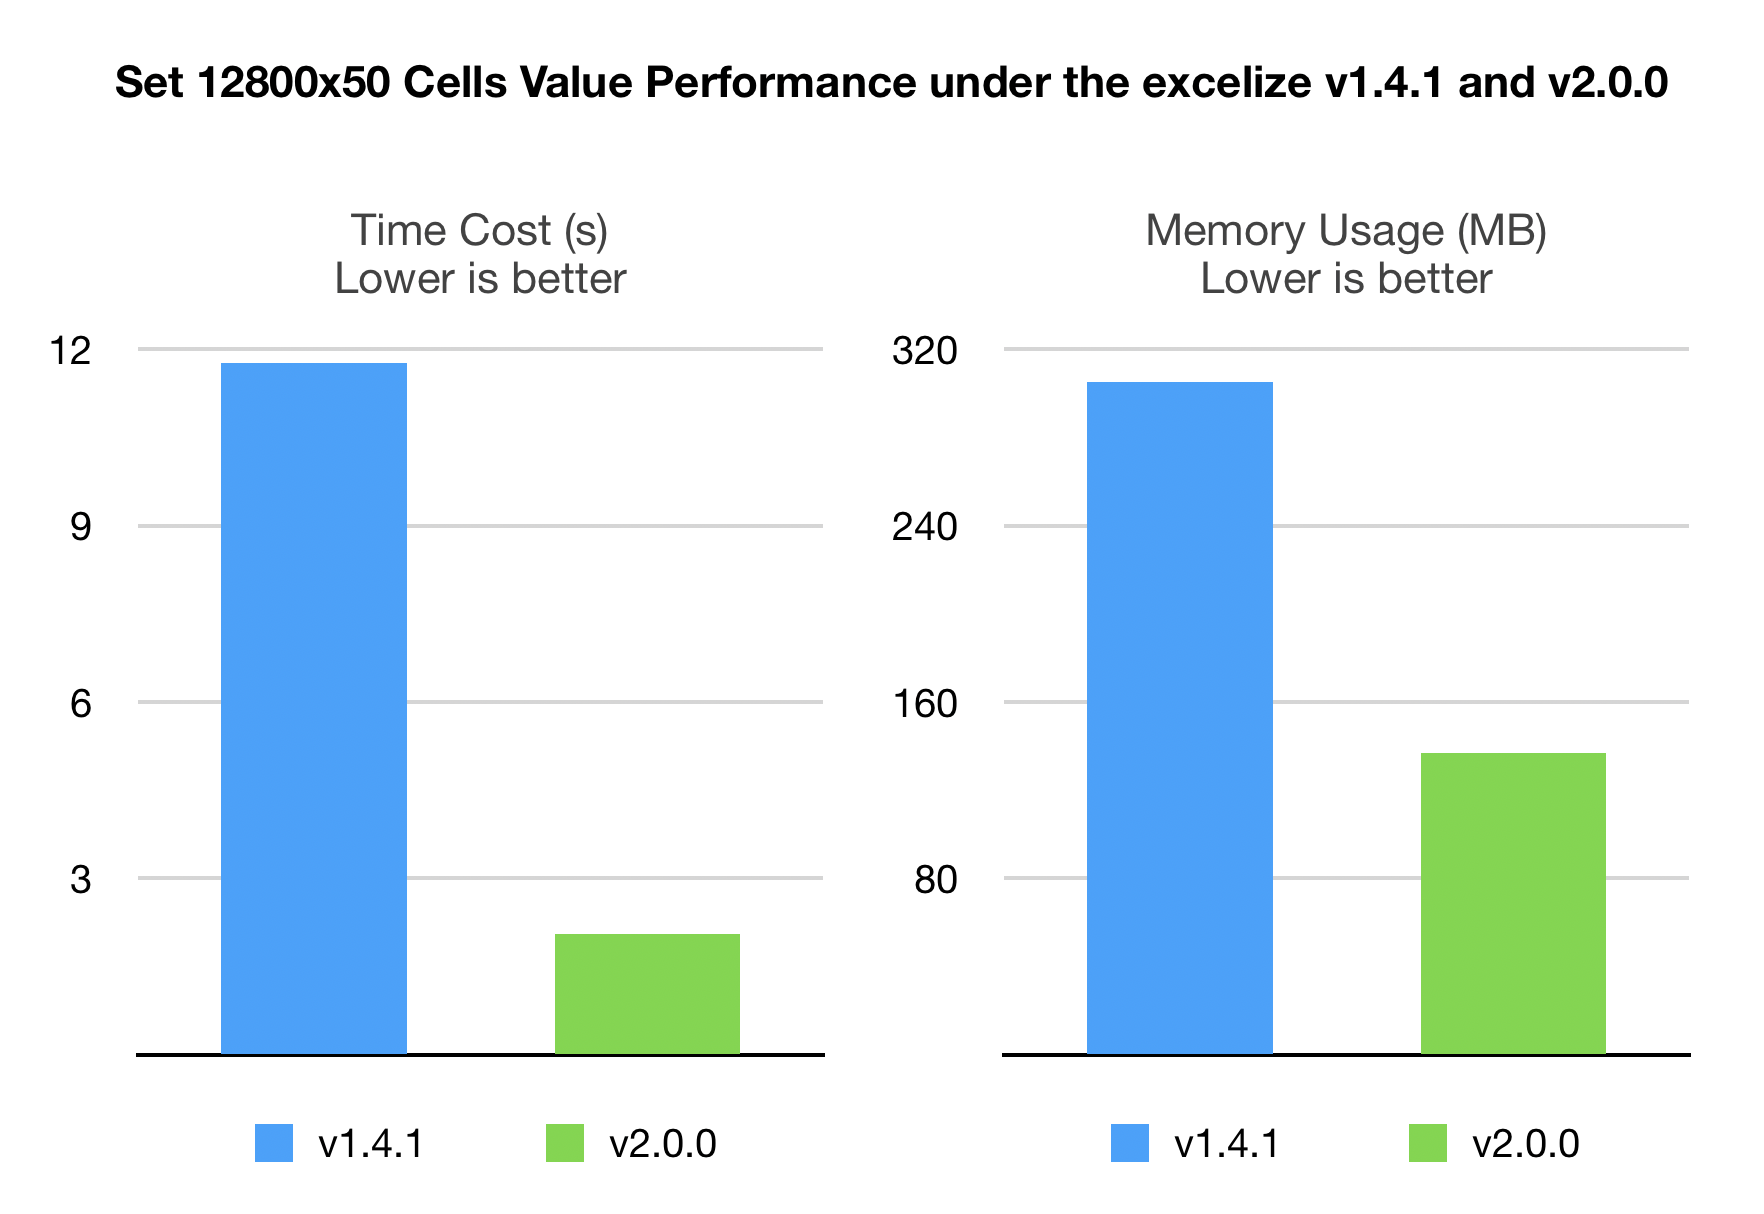 Excelize version 1.4.1 vs 2.0.0